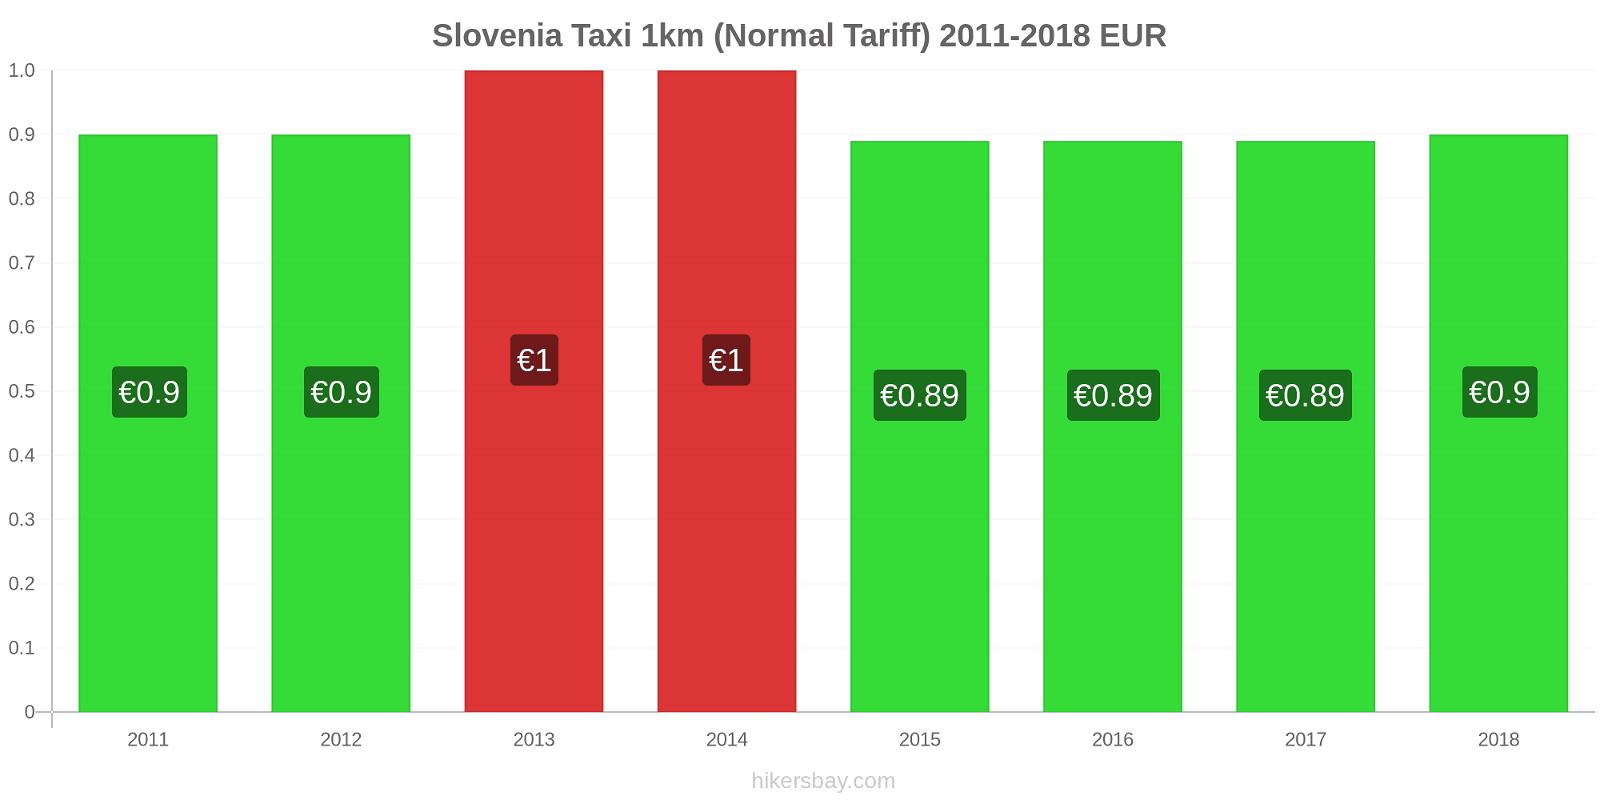 Slovenia price changes Taxi 1km (Normal Tariff) hikersbay.com